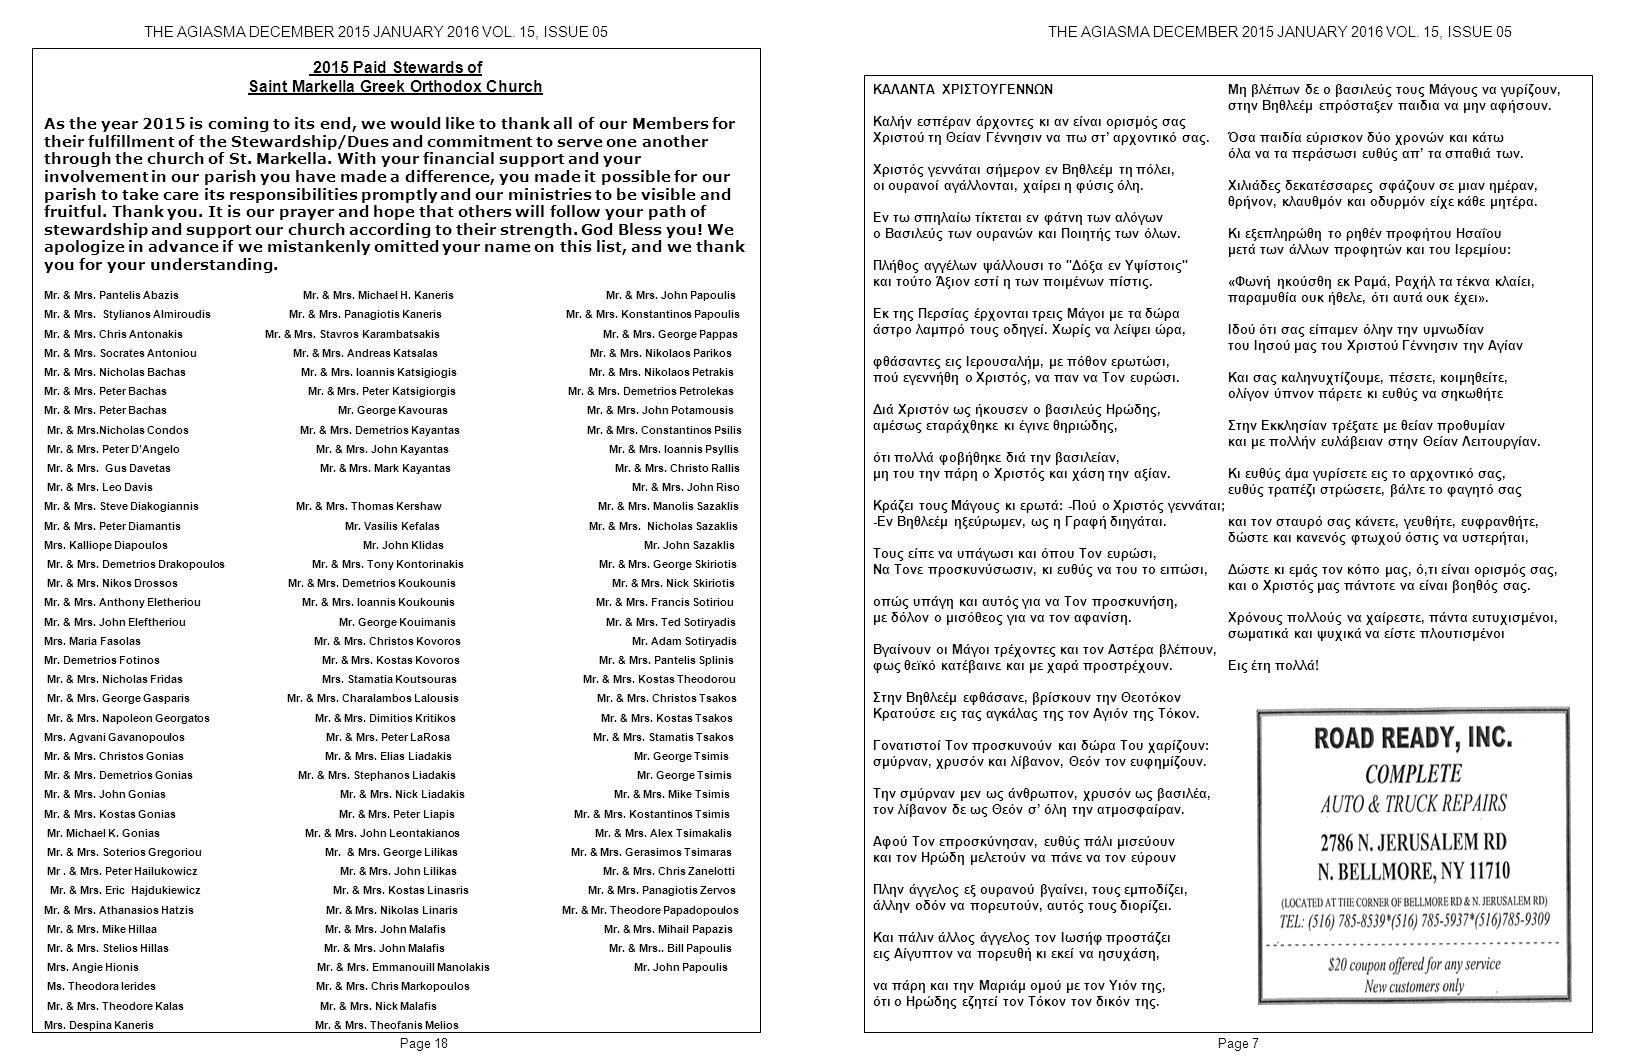 Page 18 THE AGIASMA DECEMBER 2015 JANUARY 2016 VOL. 15, ISSUE 05 ΚΑΛΑΝΤΑ ΧΡΙΣΤΟΥΓΕΝΝΩΝ Καλήν εσπέραν άρχοντες κι αν είναι ορισμός σας Χριστού τη Θείαν